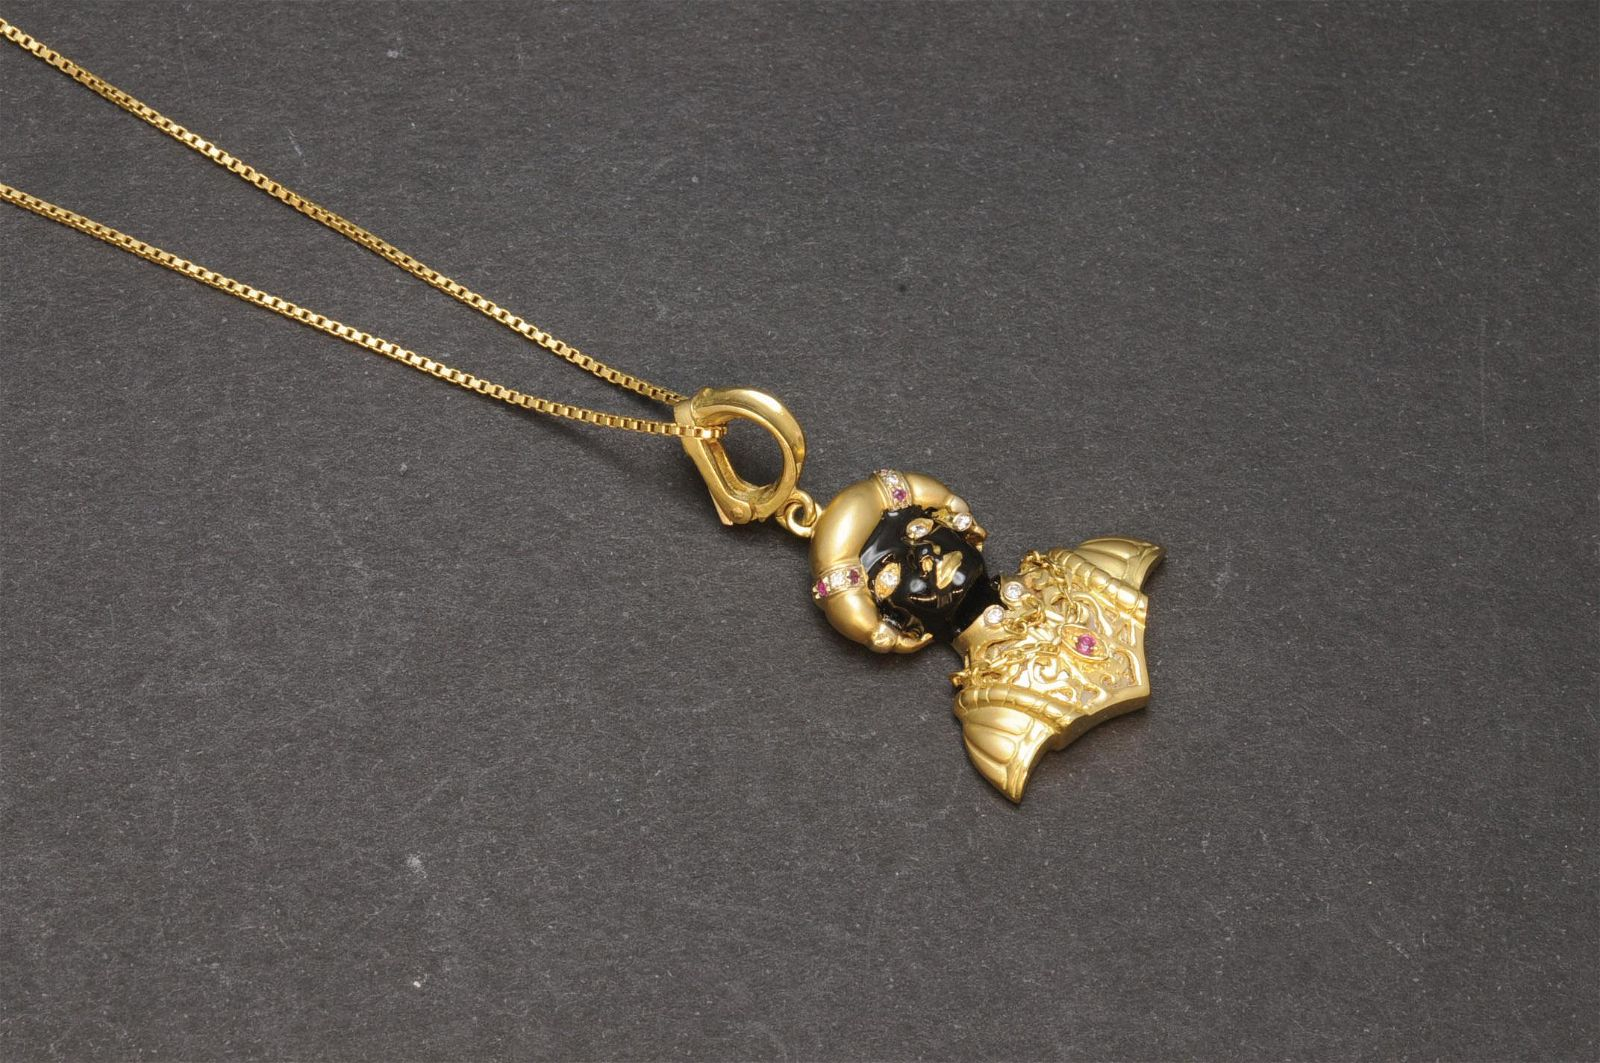 Moretto gold, enamel and diamond pendant